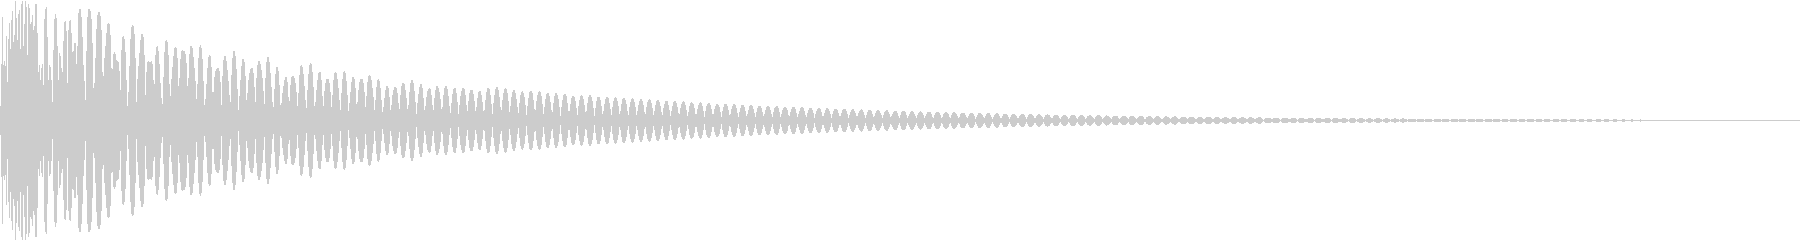 DTM Tom 30 オリジナル音源の未再生の波形